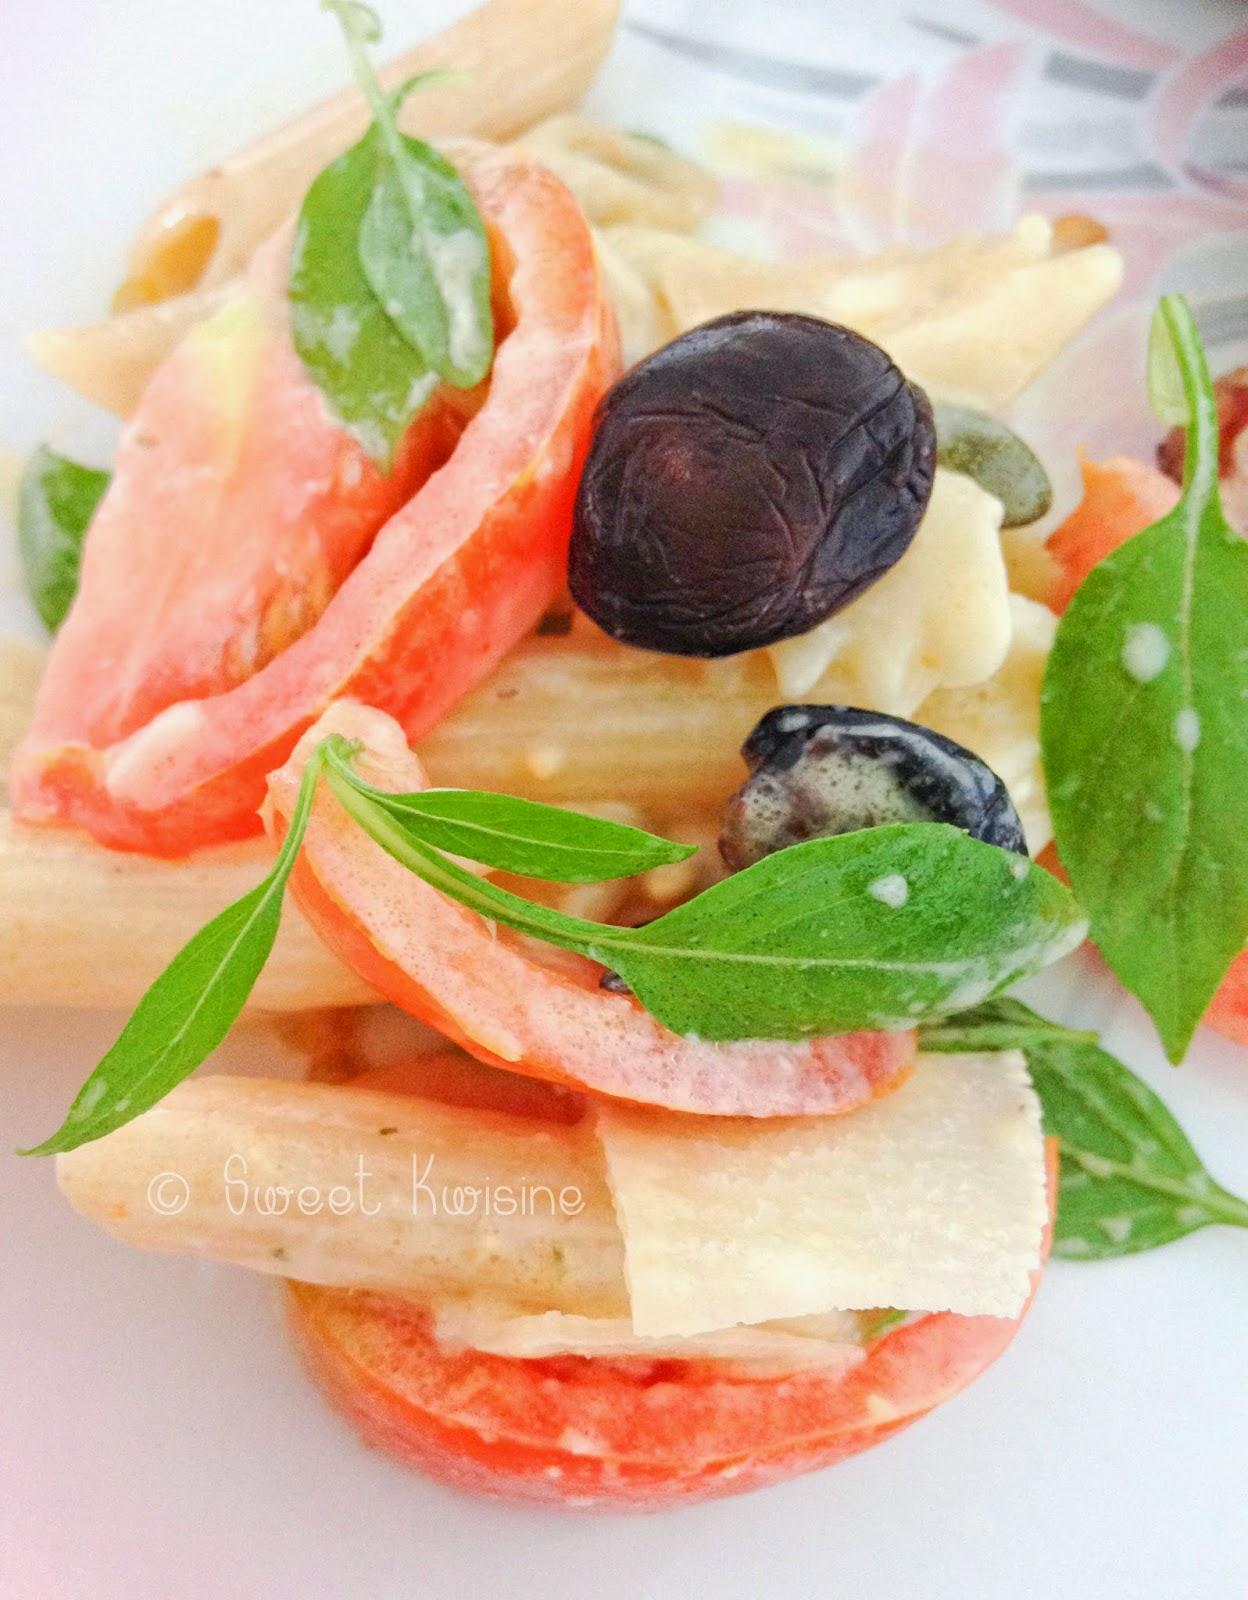 sweet kwisine, salade, pâtes, tomates, basilic, olives noires, cuisine rapide, cuisine végétarienne, italie, parmesan